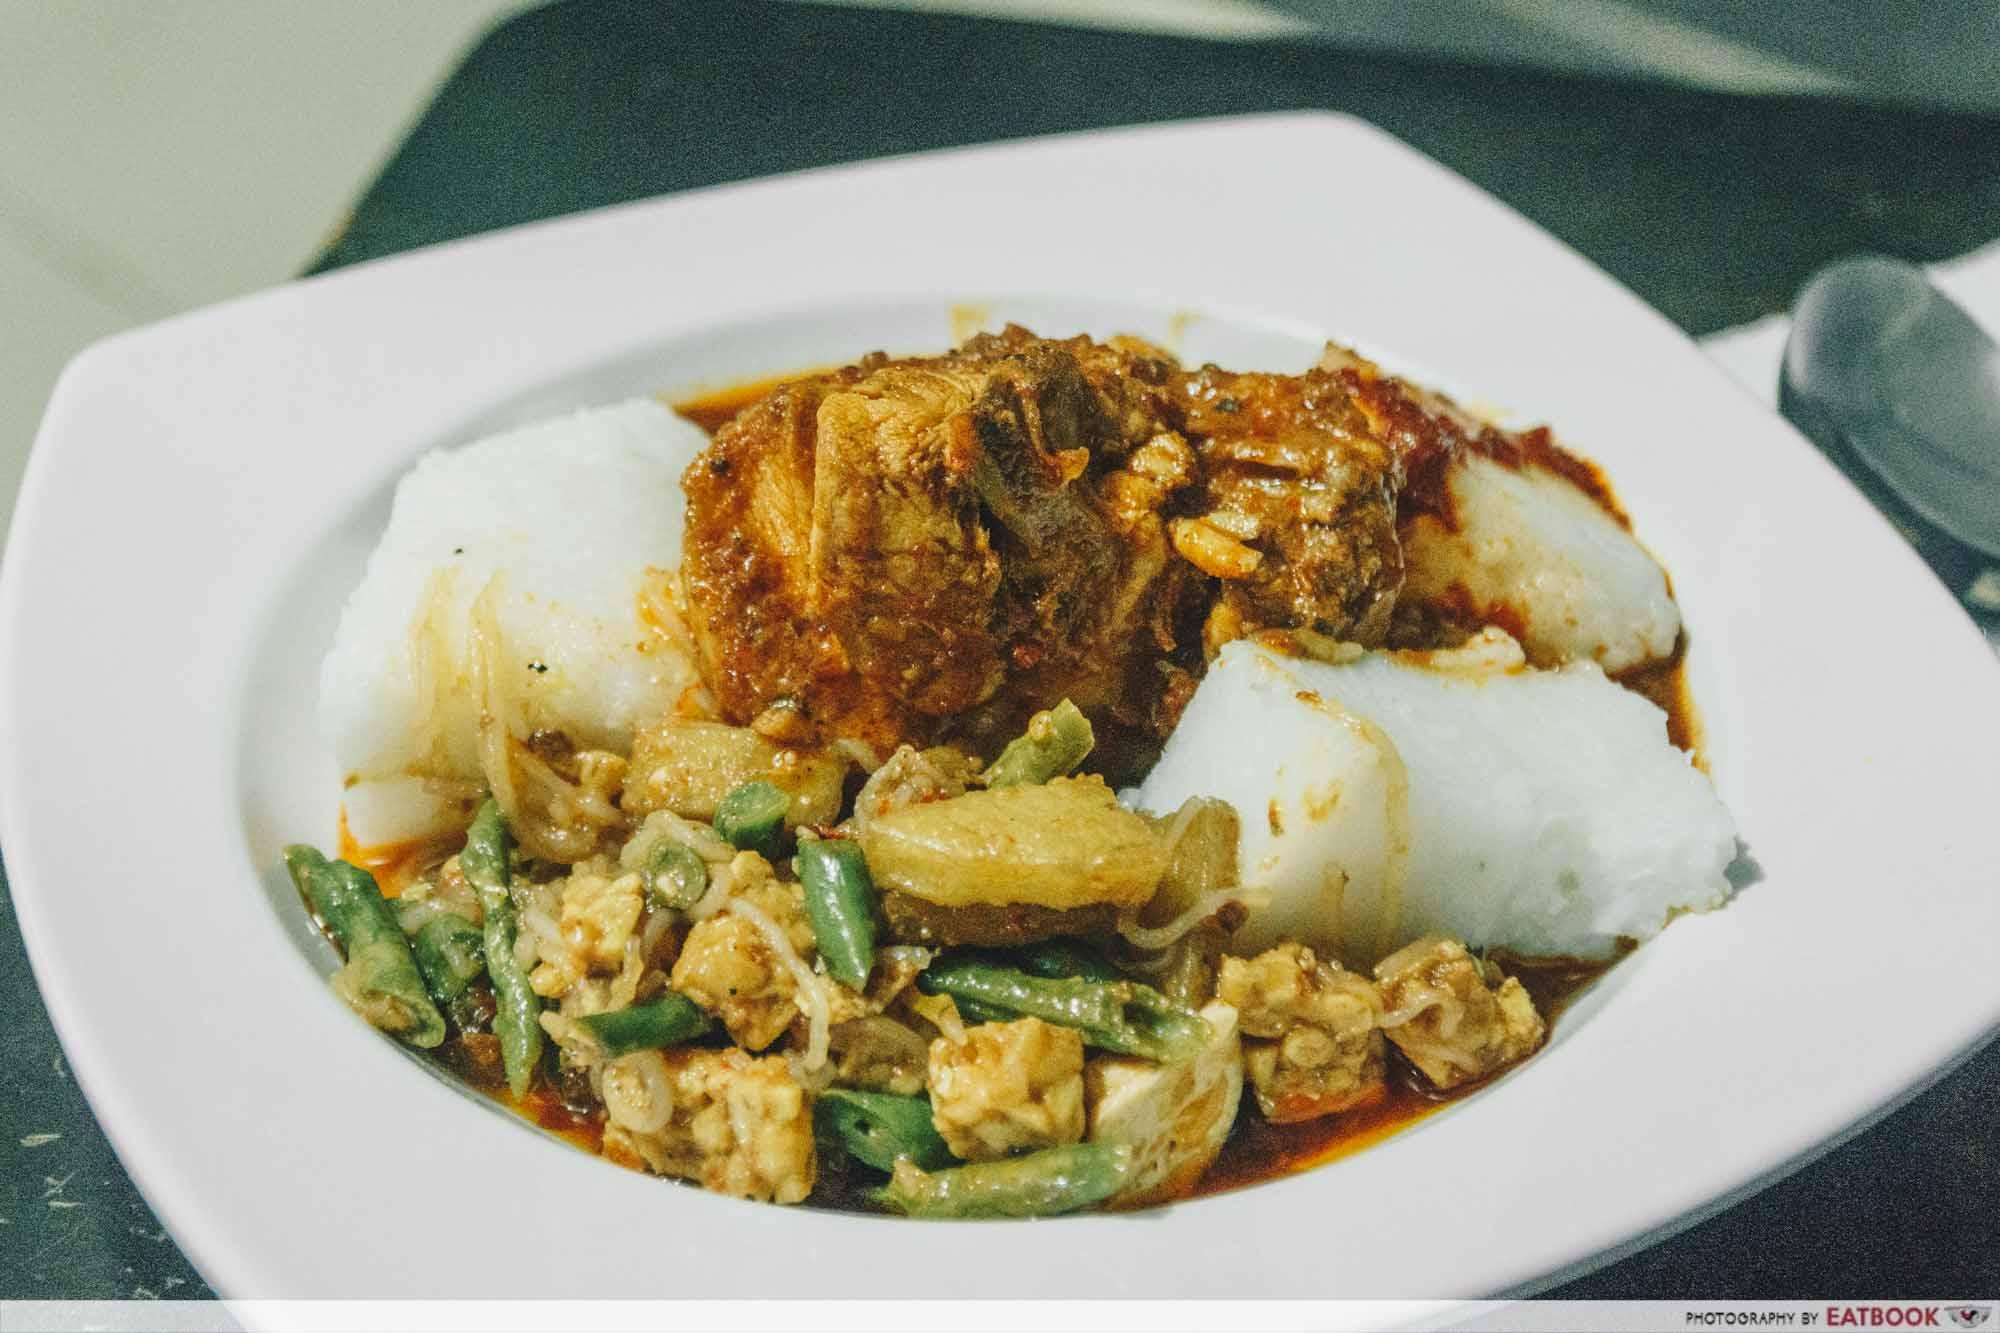 Johor Bahru Hawker Food - Lontong Kering